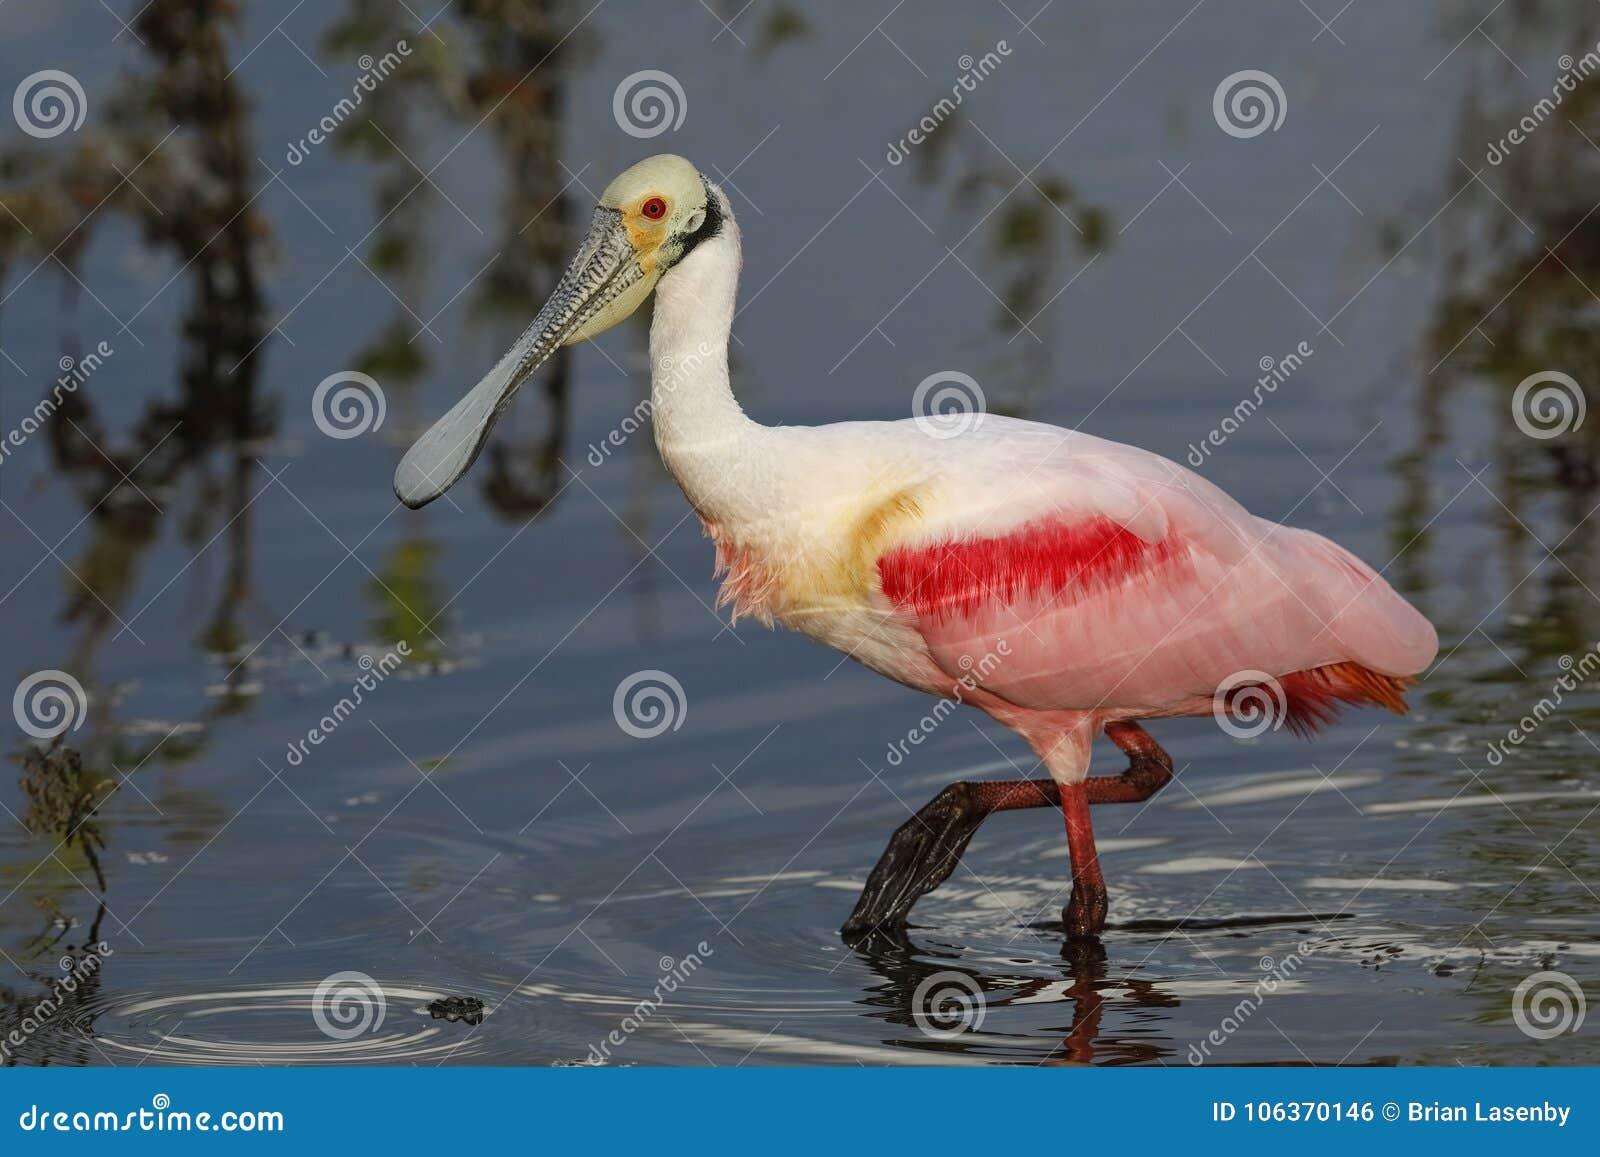 Roseate Spoonbill foraging in a lagoon - Merritt Island Wildlife